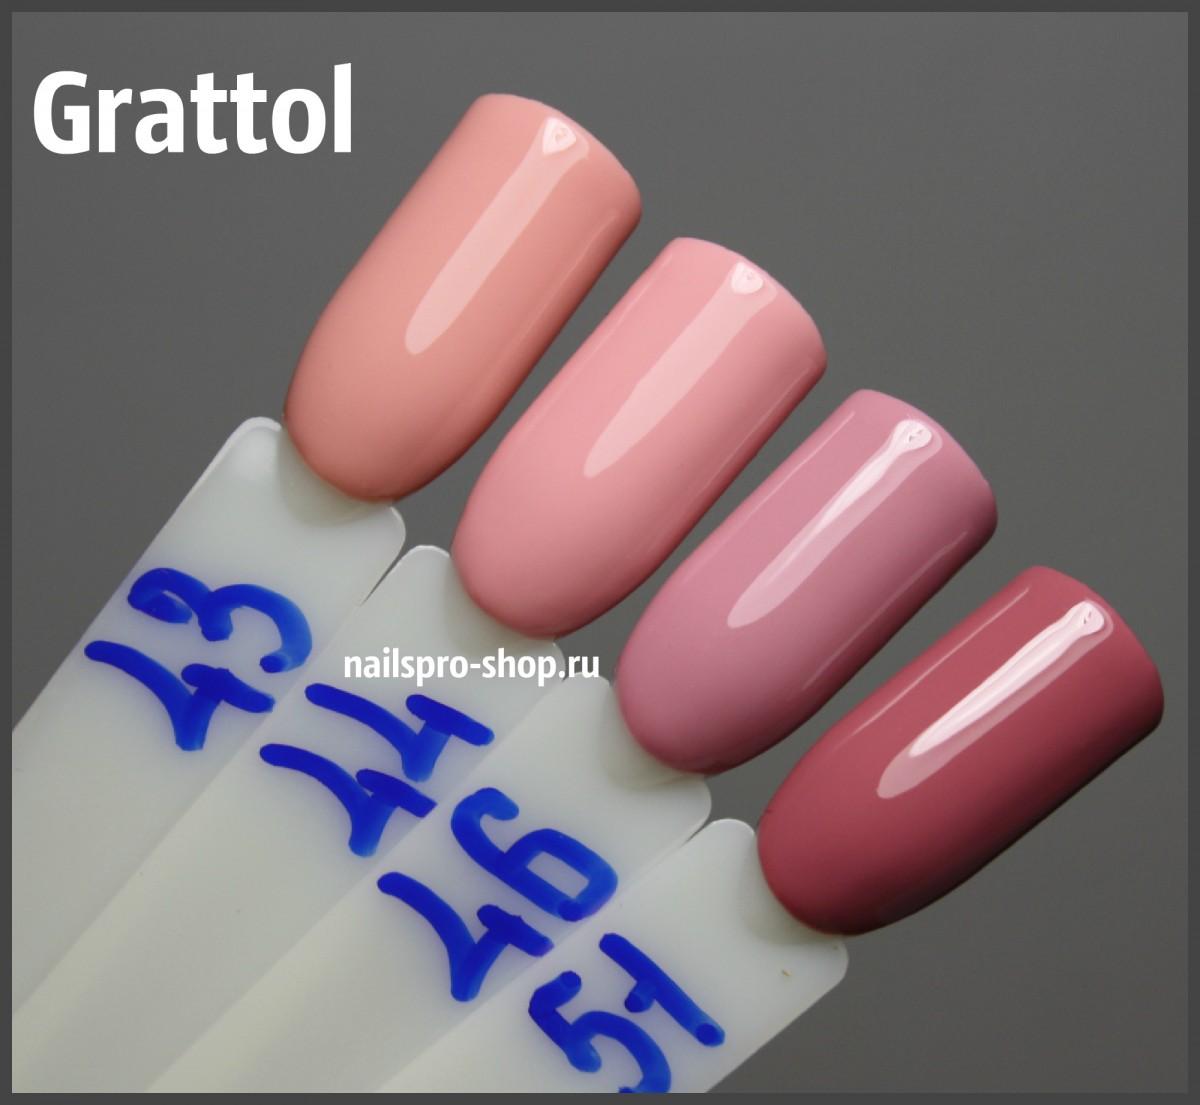 Grattol Color Gel Polish 051 Dusty Rose